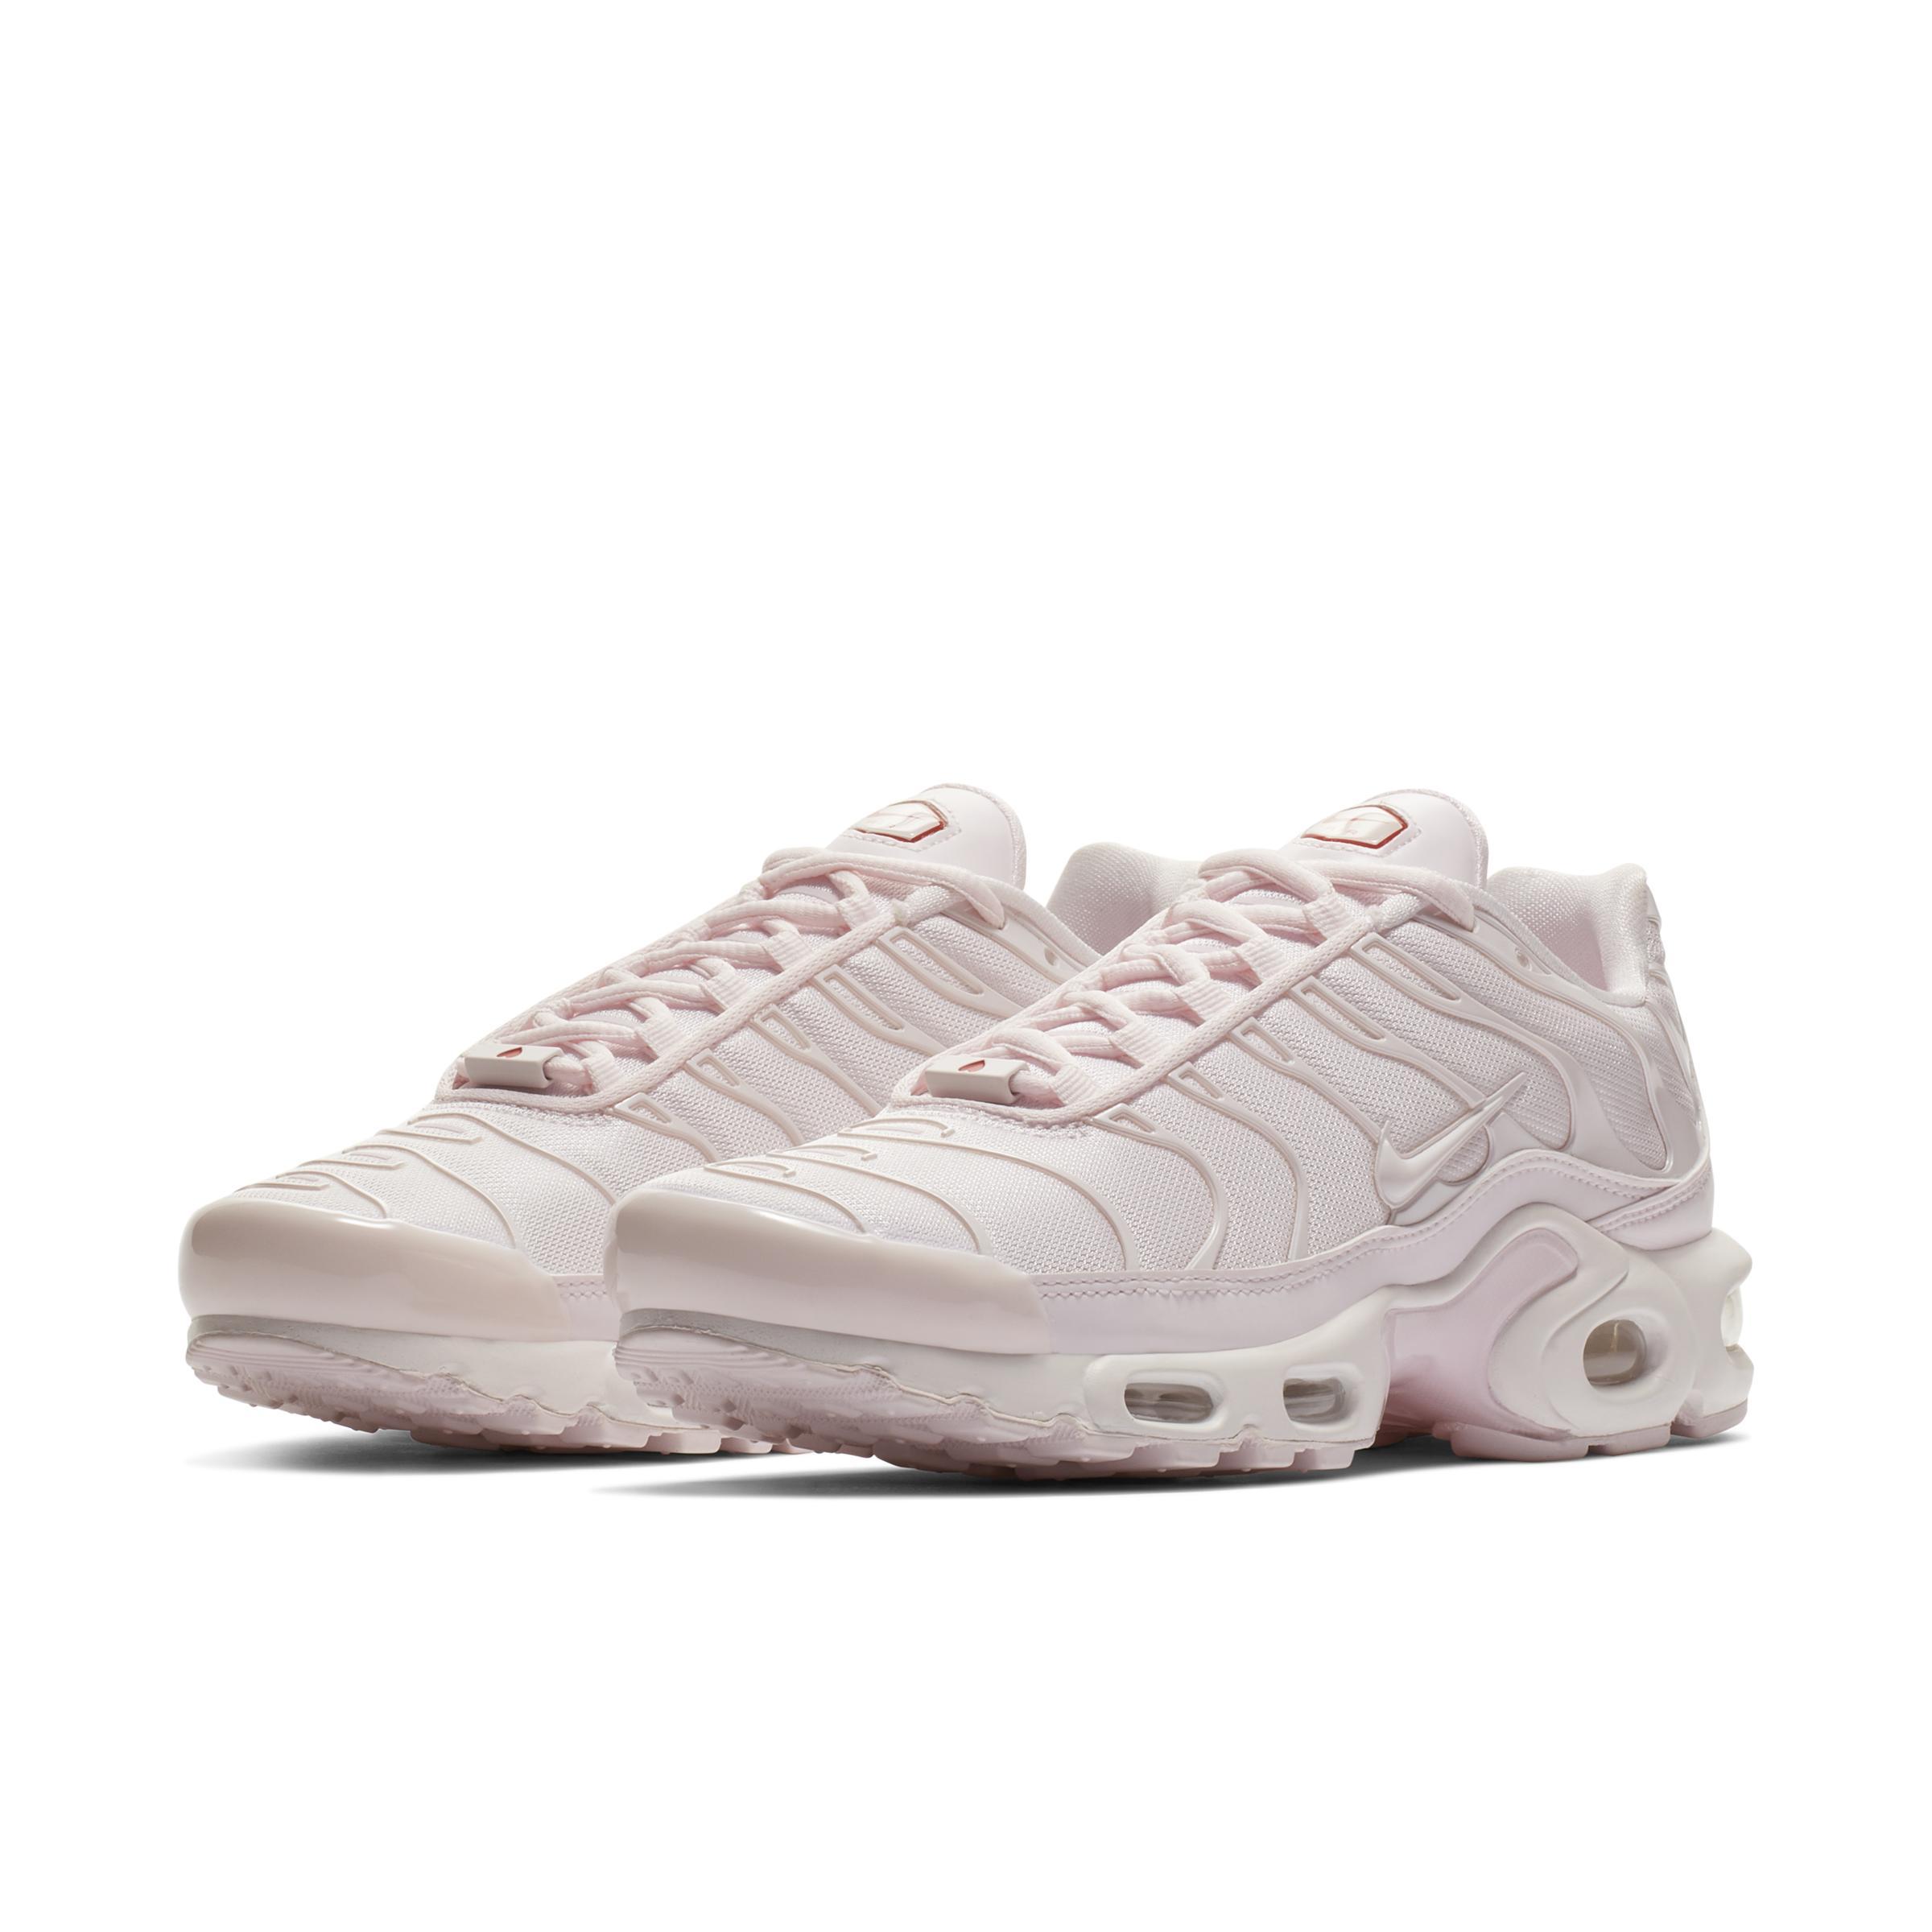 Nike Pink Air Max Plus TN SE Damenschuh